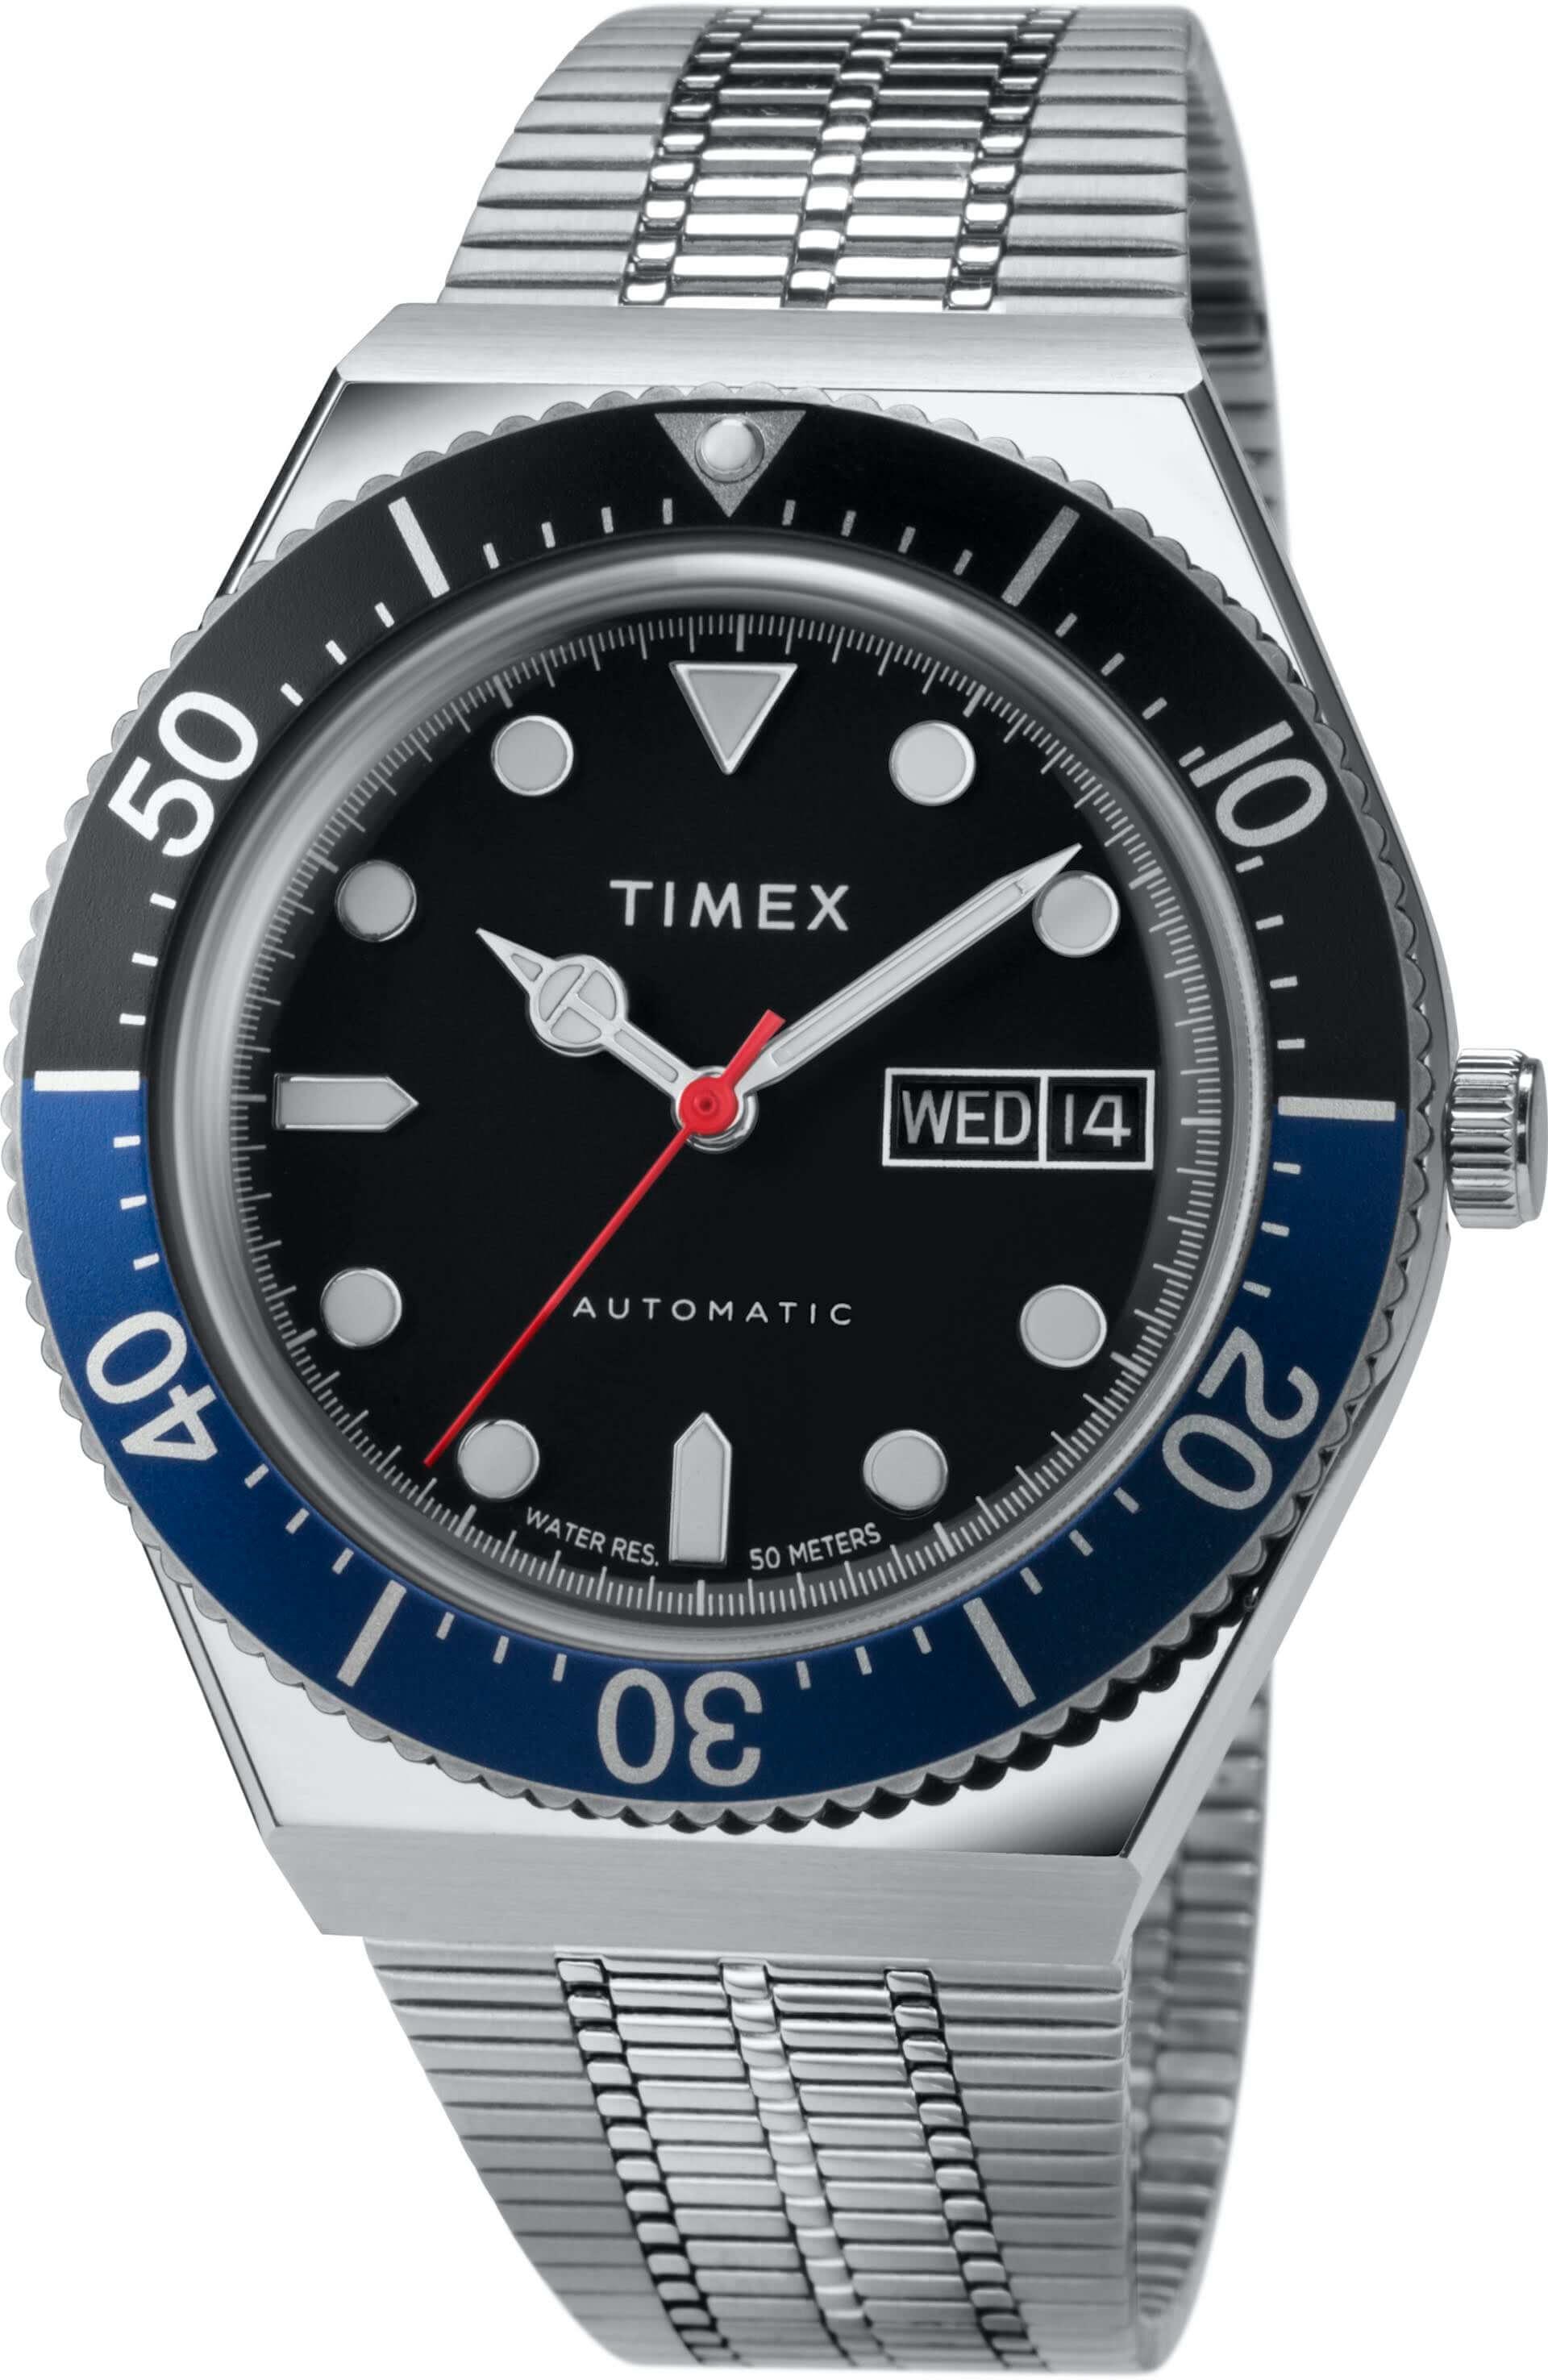 TIMEXの人気シリーズ『タイメックス キュー』に日本初上陸の派生モデル『M79』が登場!スケルトン仕様の裏蓋にも注目 tech201028_timex_2-1920x2952